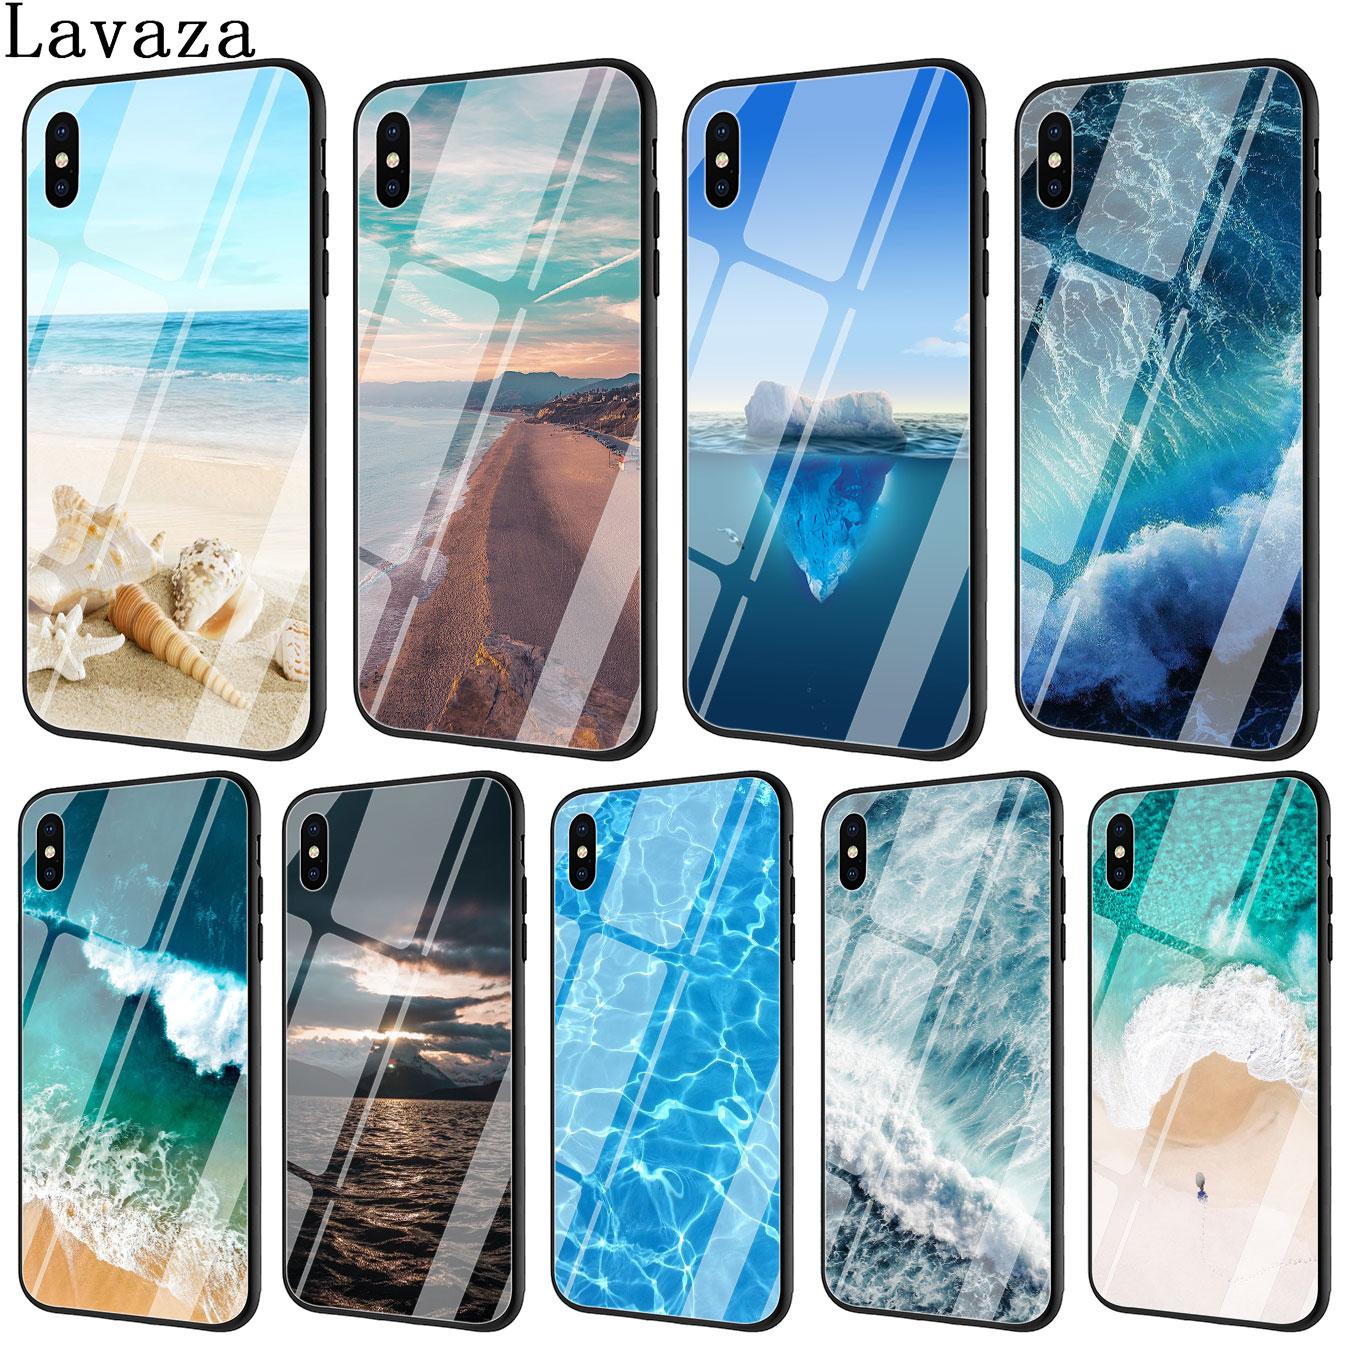 Lavaza Praia Do Mar spray de Vidro Temperado Caso Tampa Do Telefone para o iPhone Da Apple XR X XS Max 6 6 s 7 8 Plus 5 5S SE 10 Casos 7 8 Plus Plus